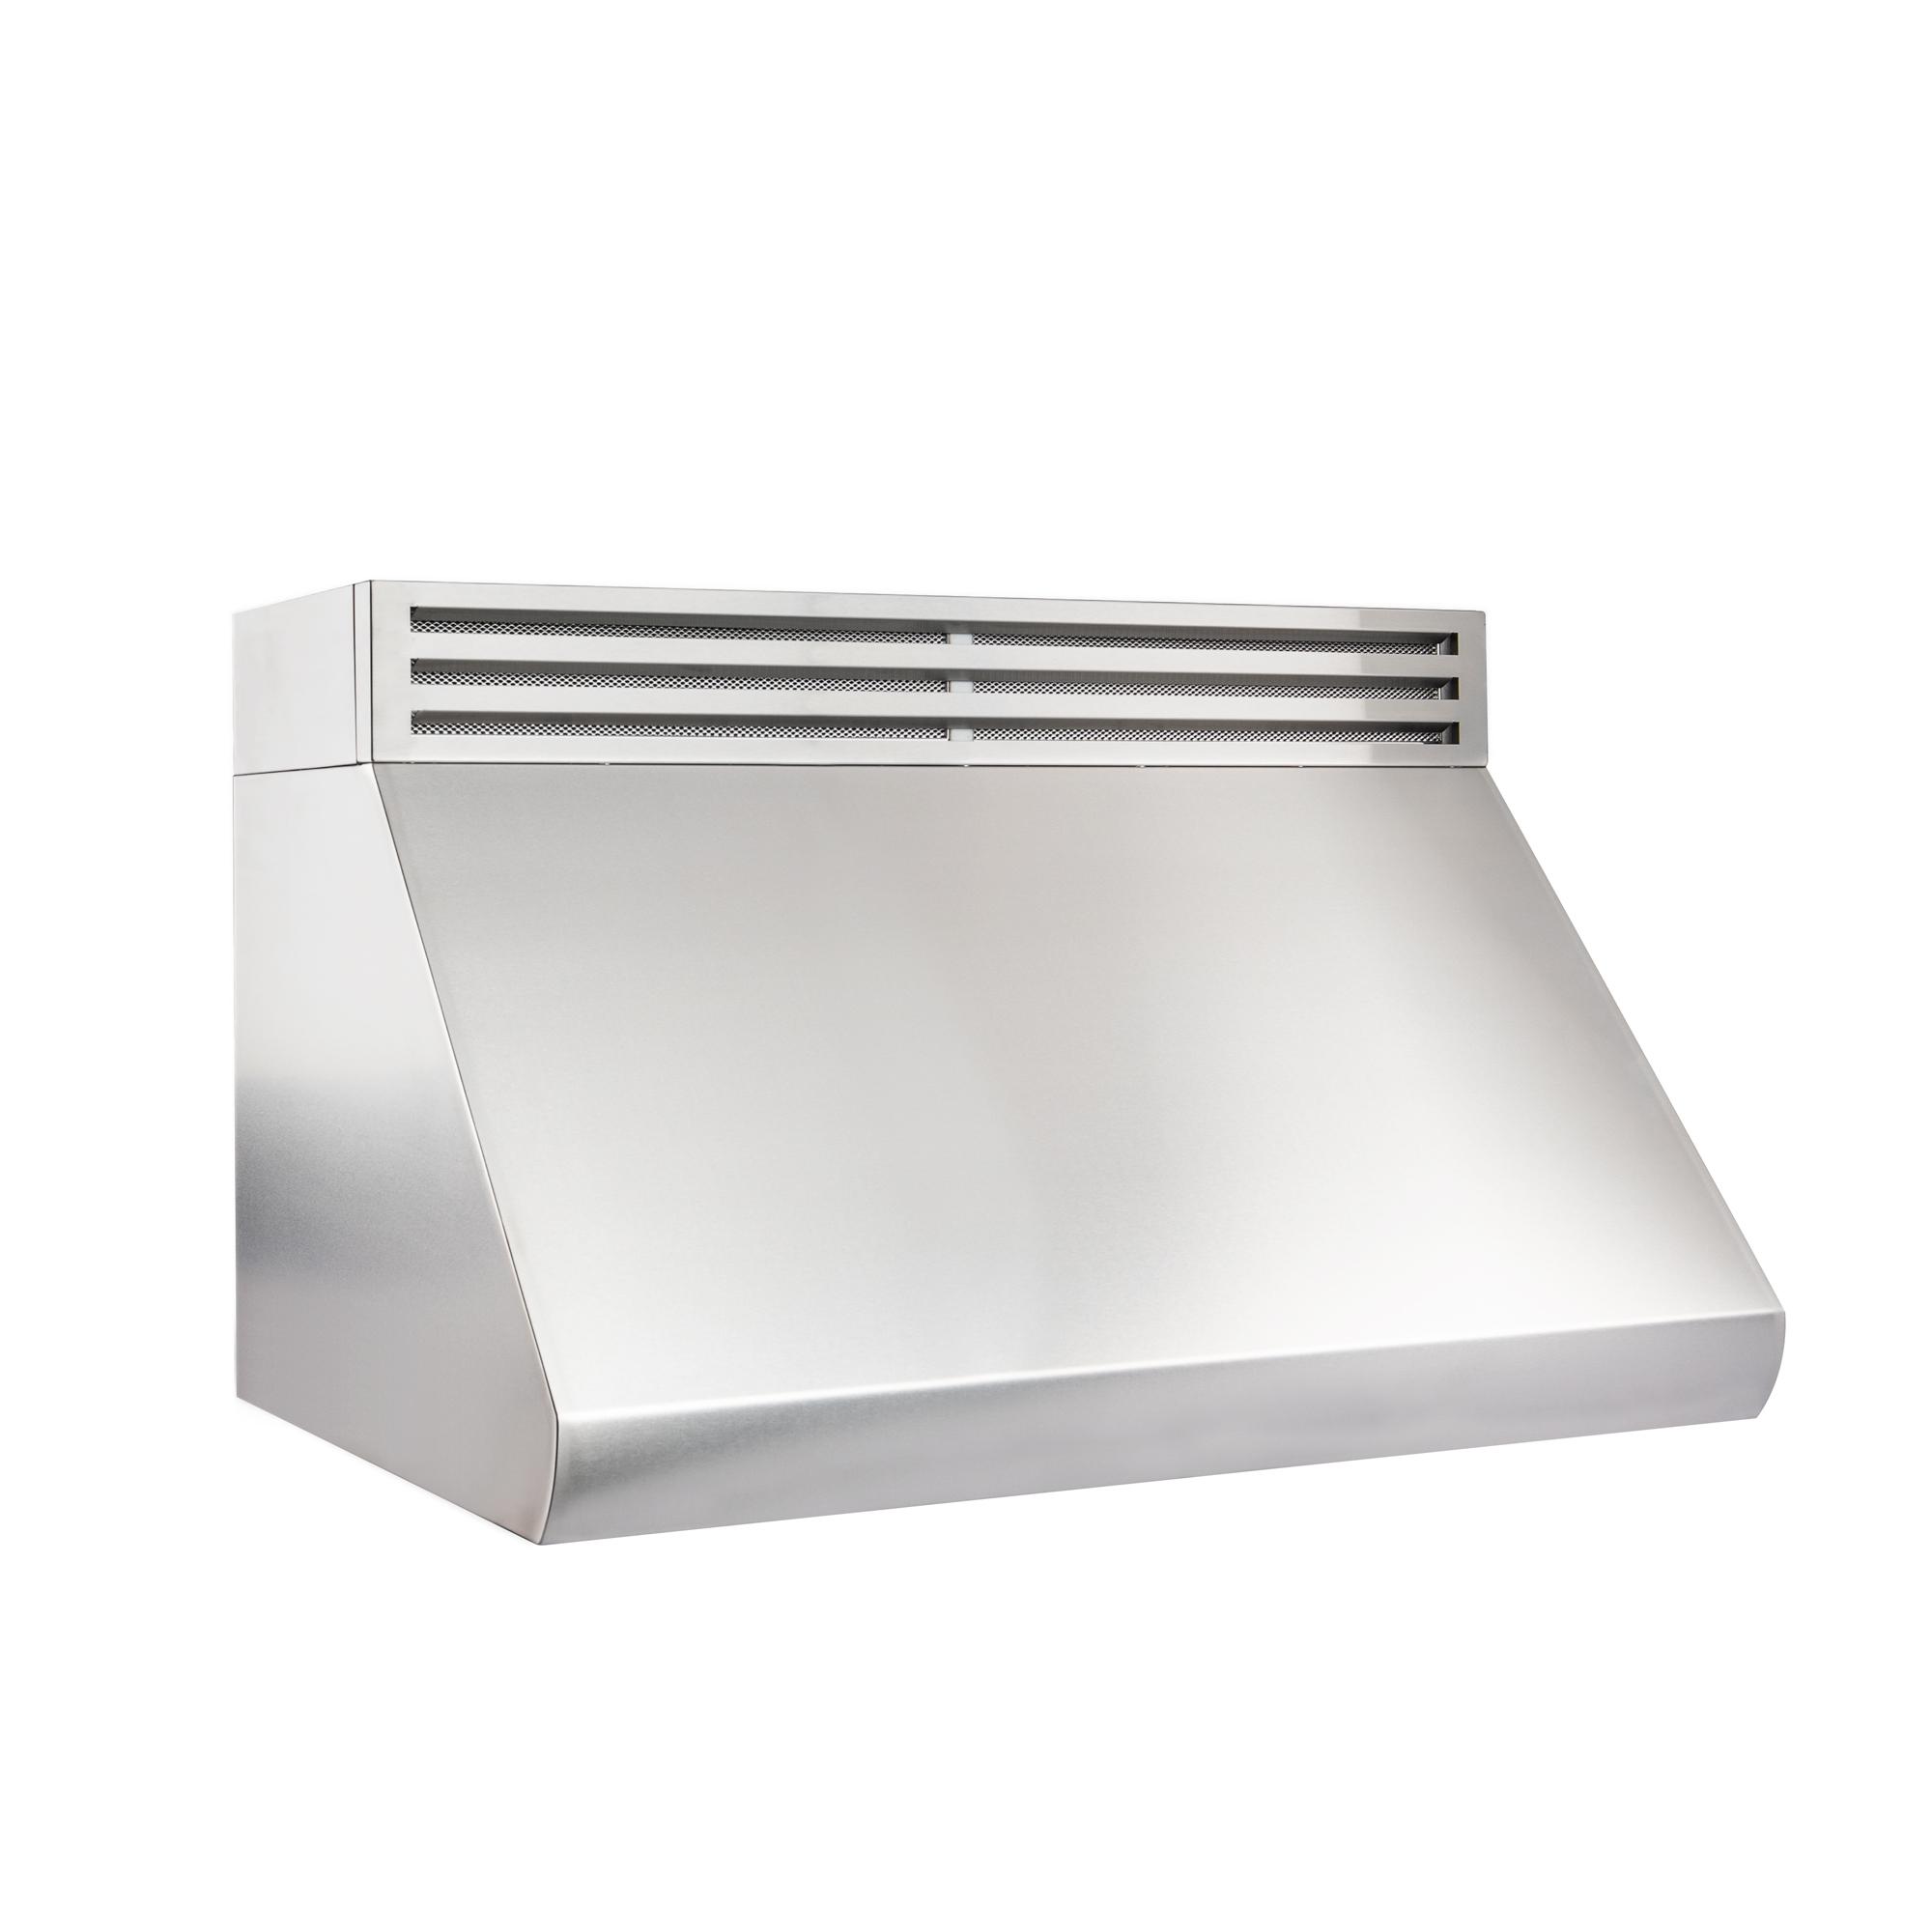 zline-stainless-steel-under-cabinet-range-hood-527-main-rk.jpg